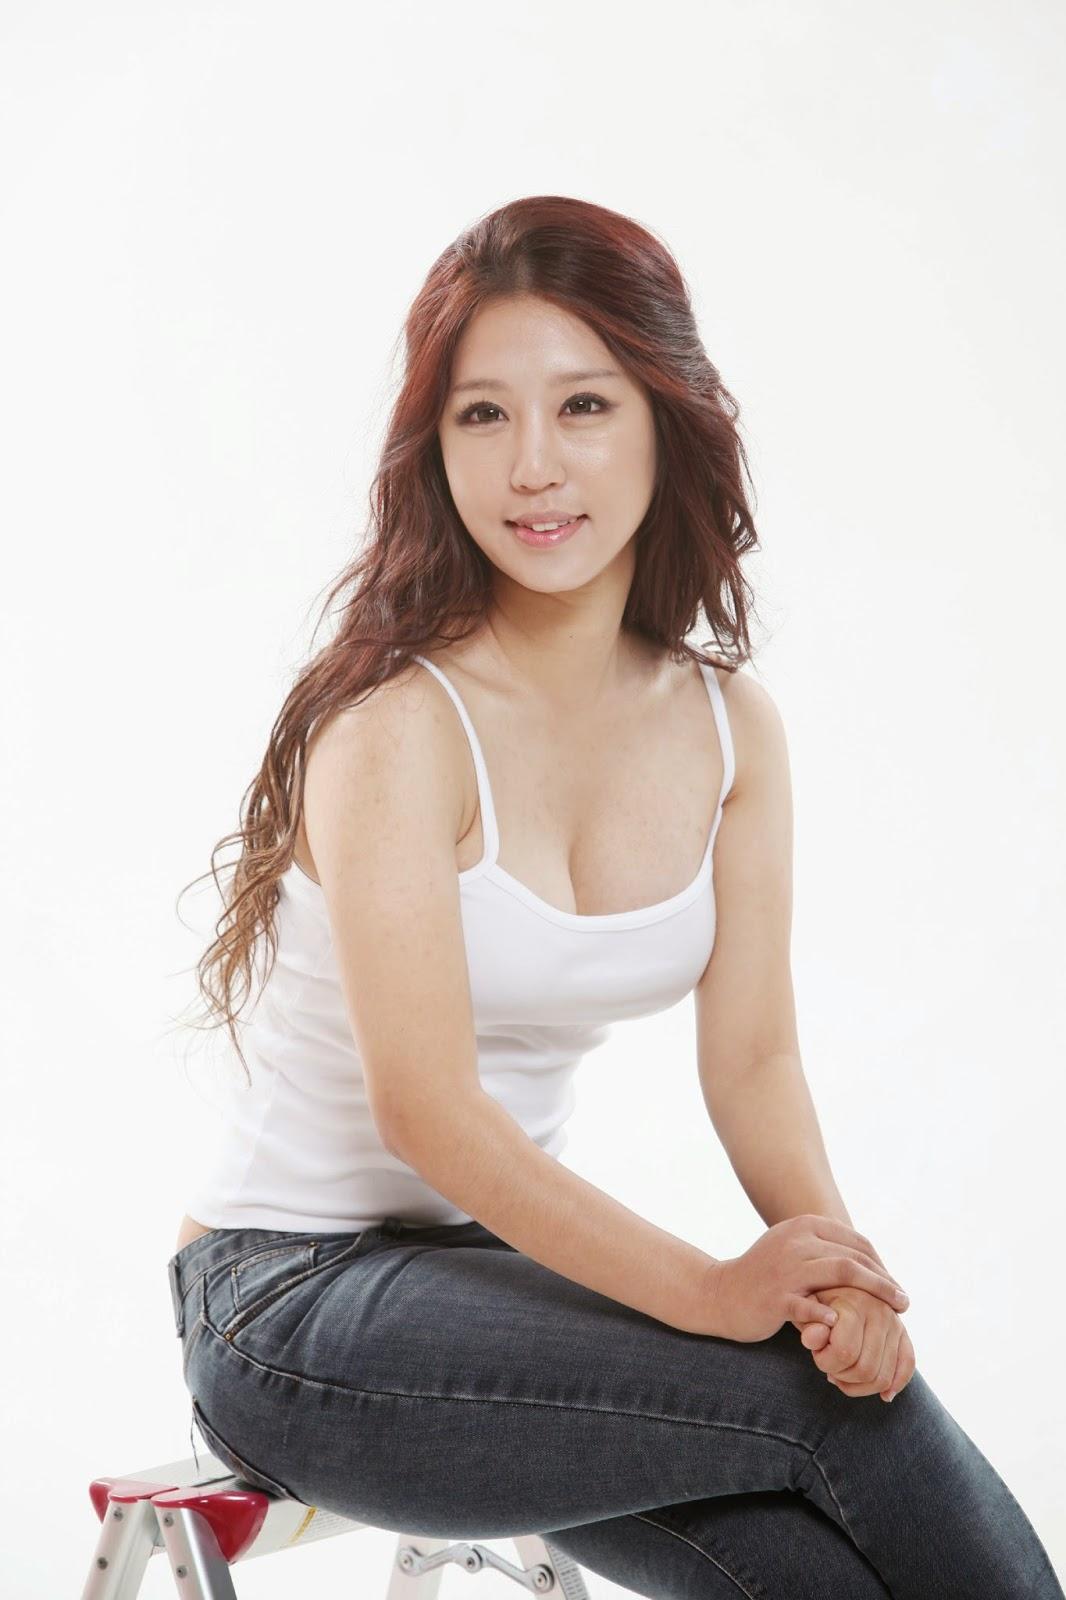 Lee Hee-jung sesudah operasi payudara-3